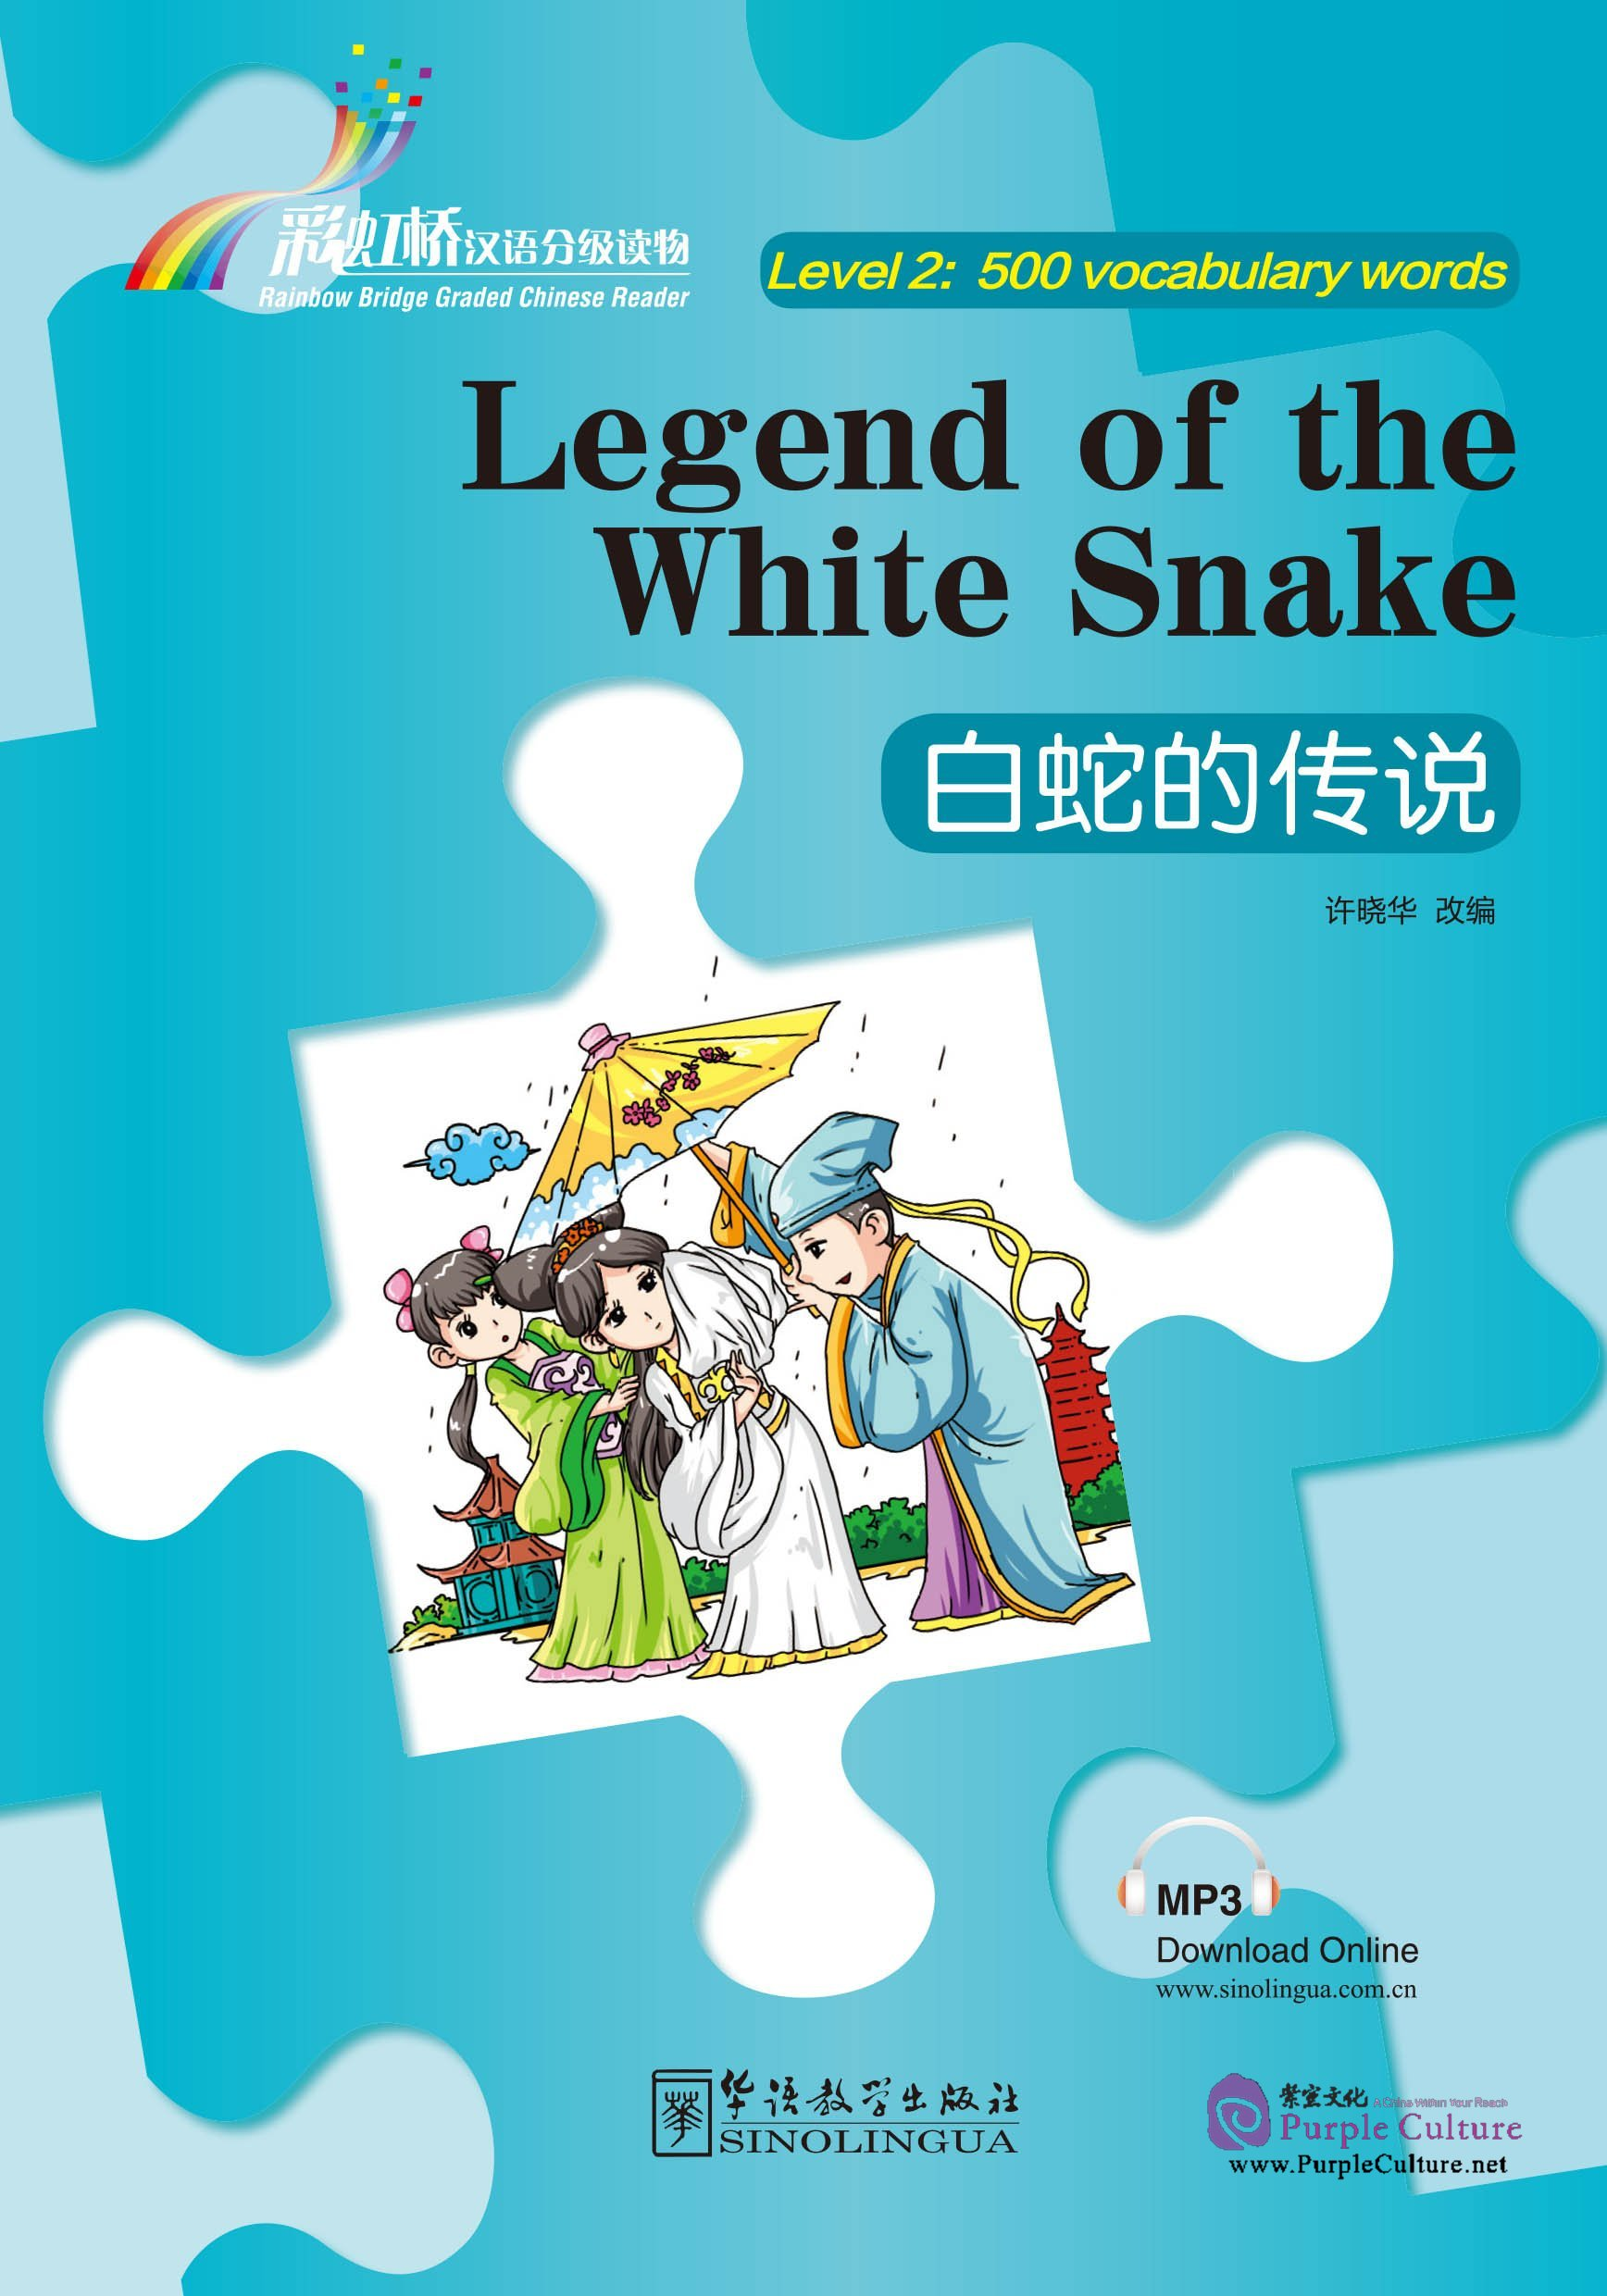 Rainbow Bridge Graded Chinese Reader Level 2 500 Vocabulary Words Legend Of The White Snake